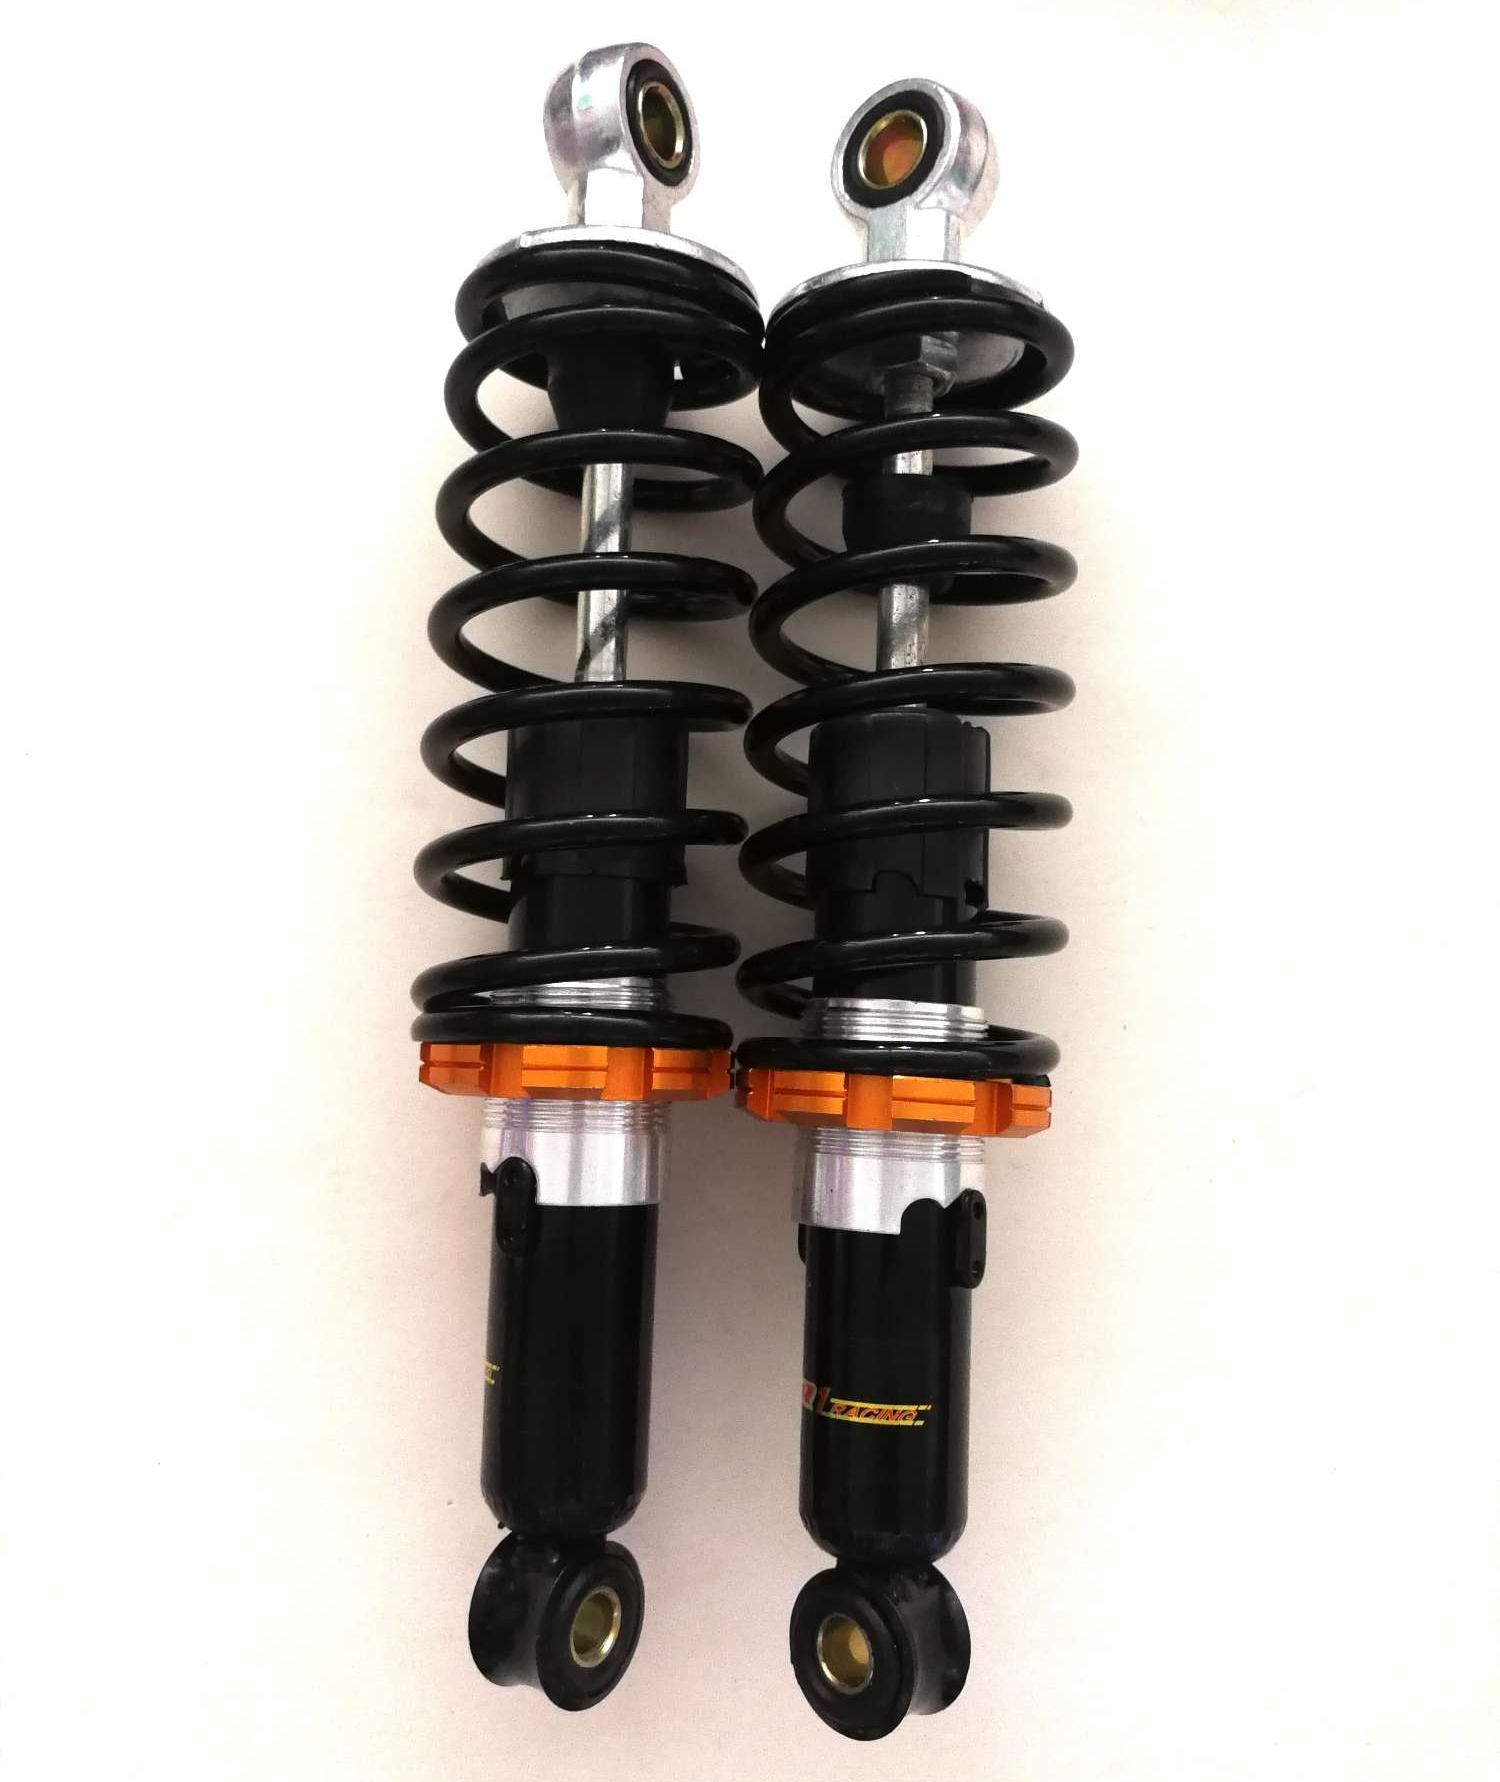 Shock absorber for xrm 280 pair(black)